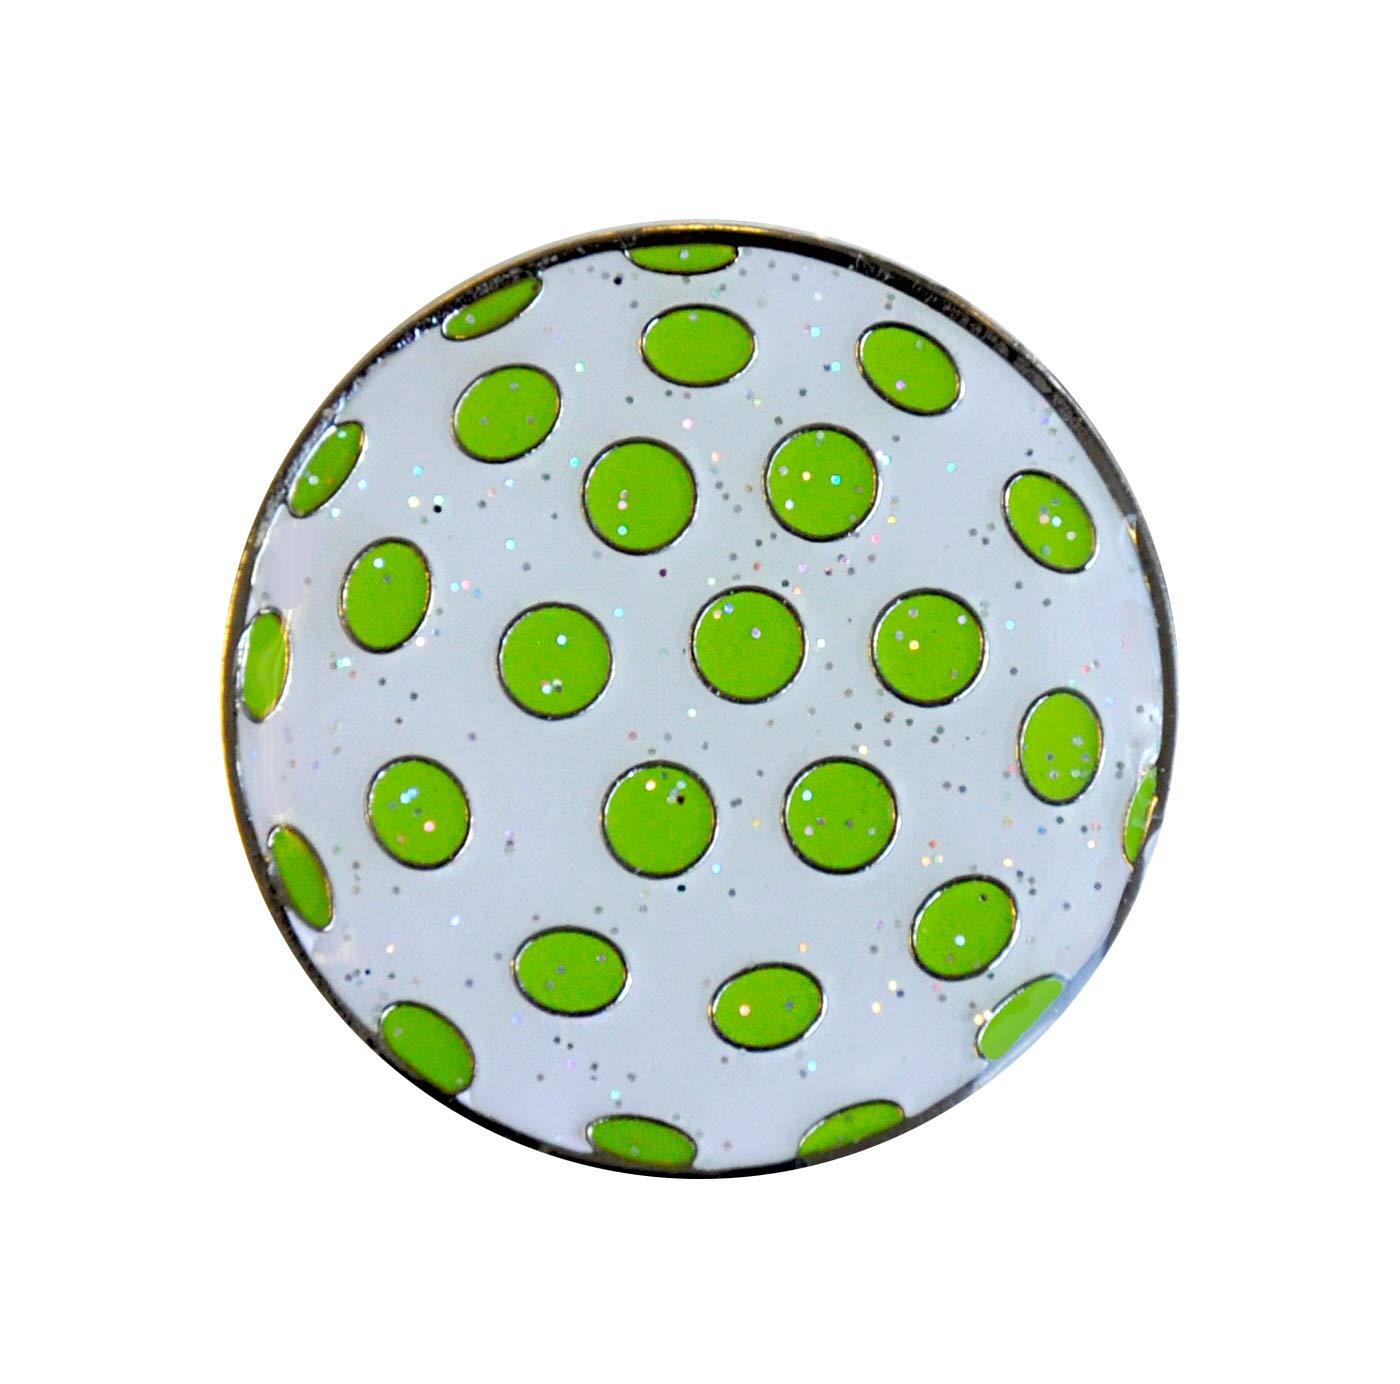 Navika Glitzy Polka Dot (ホワイト&グリーン)マーカーwith磁気帽子クリップ   B00XLVUL1I